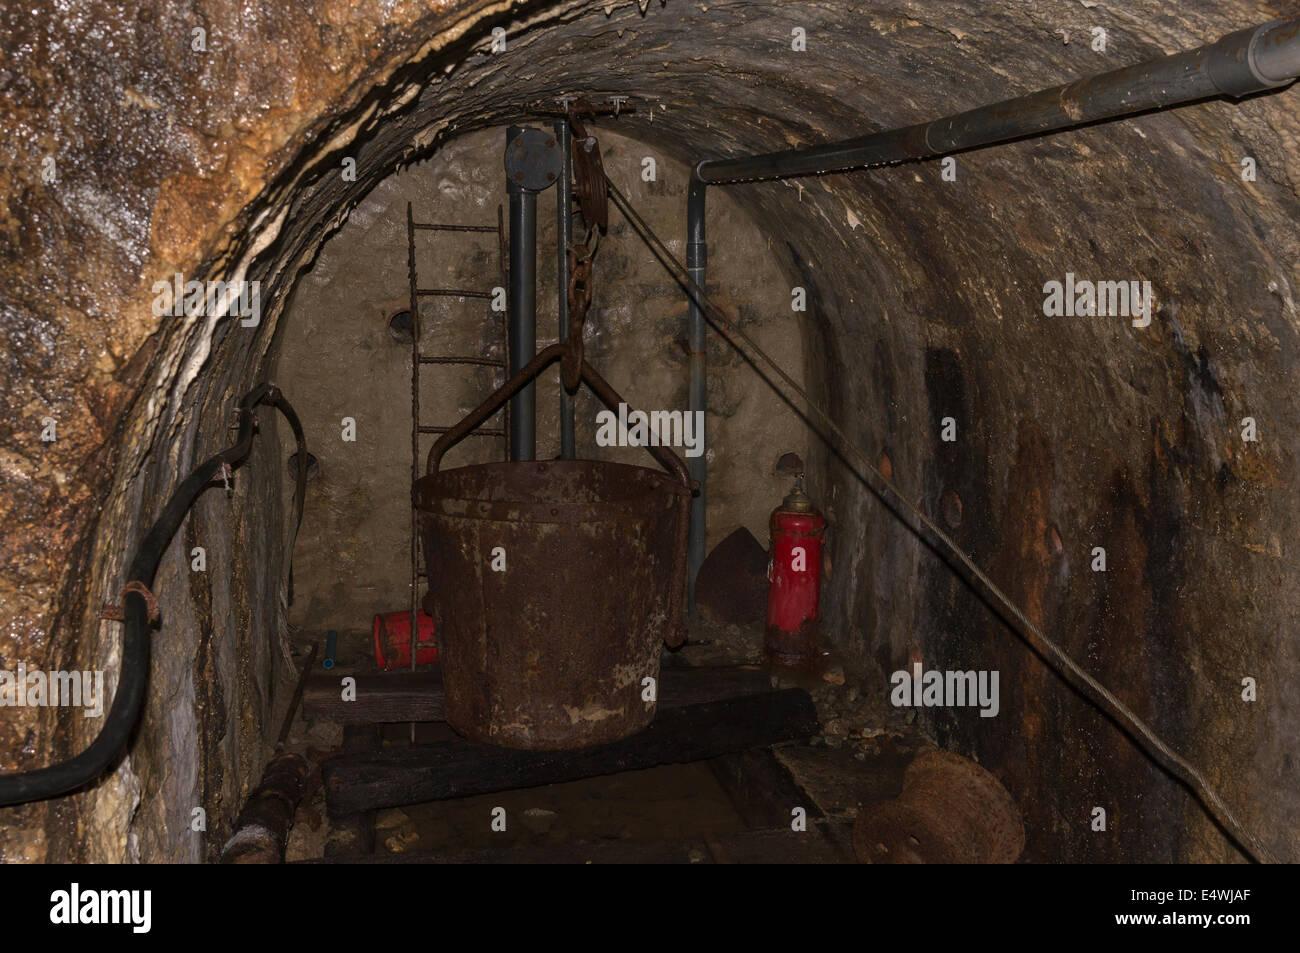 Underground at the Threlkeld Mining Museum in Cumbria - Stock Image